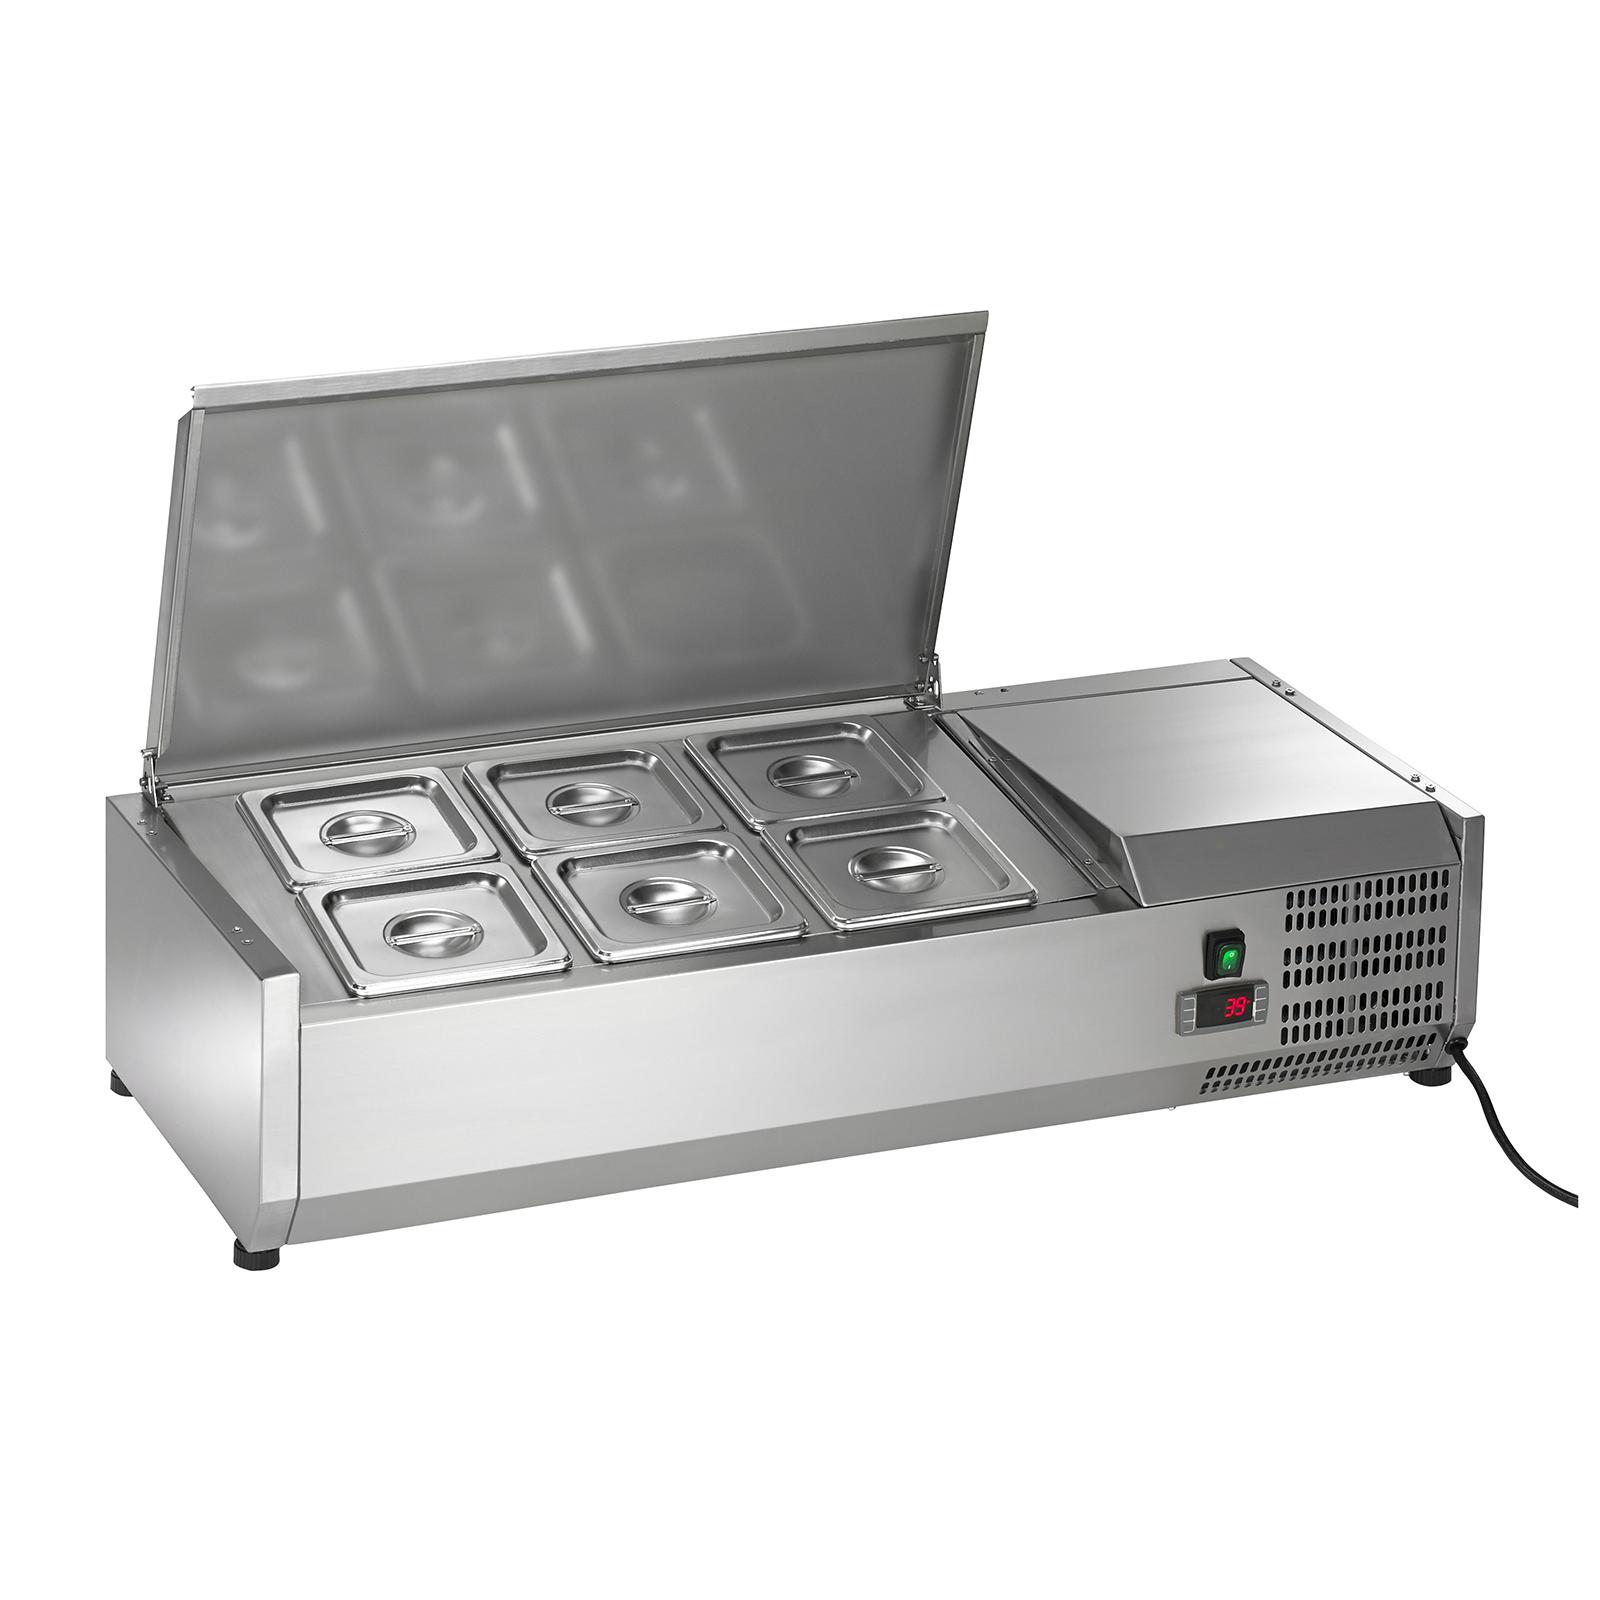 ACP40 Arctic Air refrigerated countertop pan rail